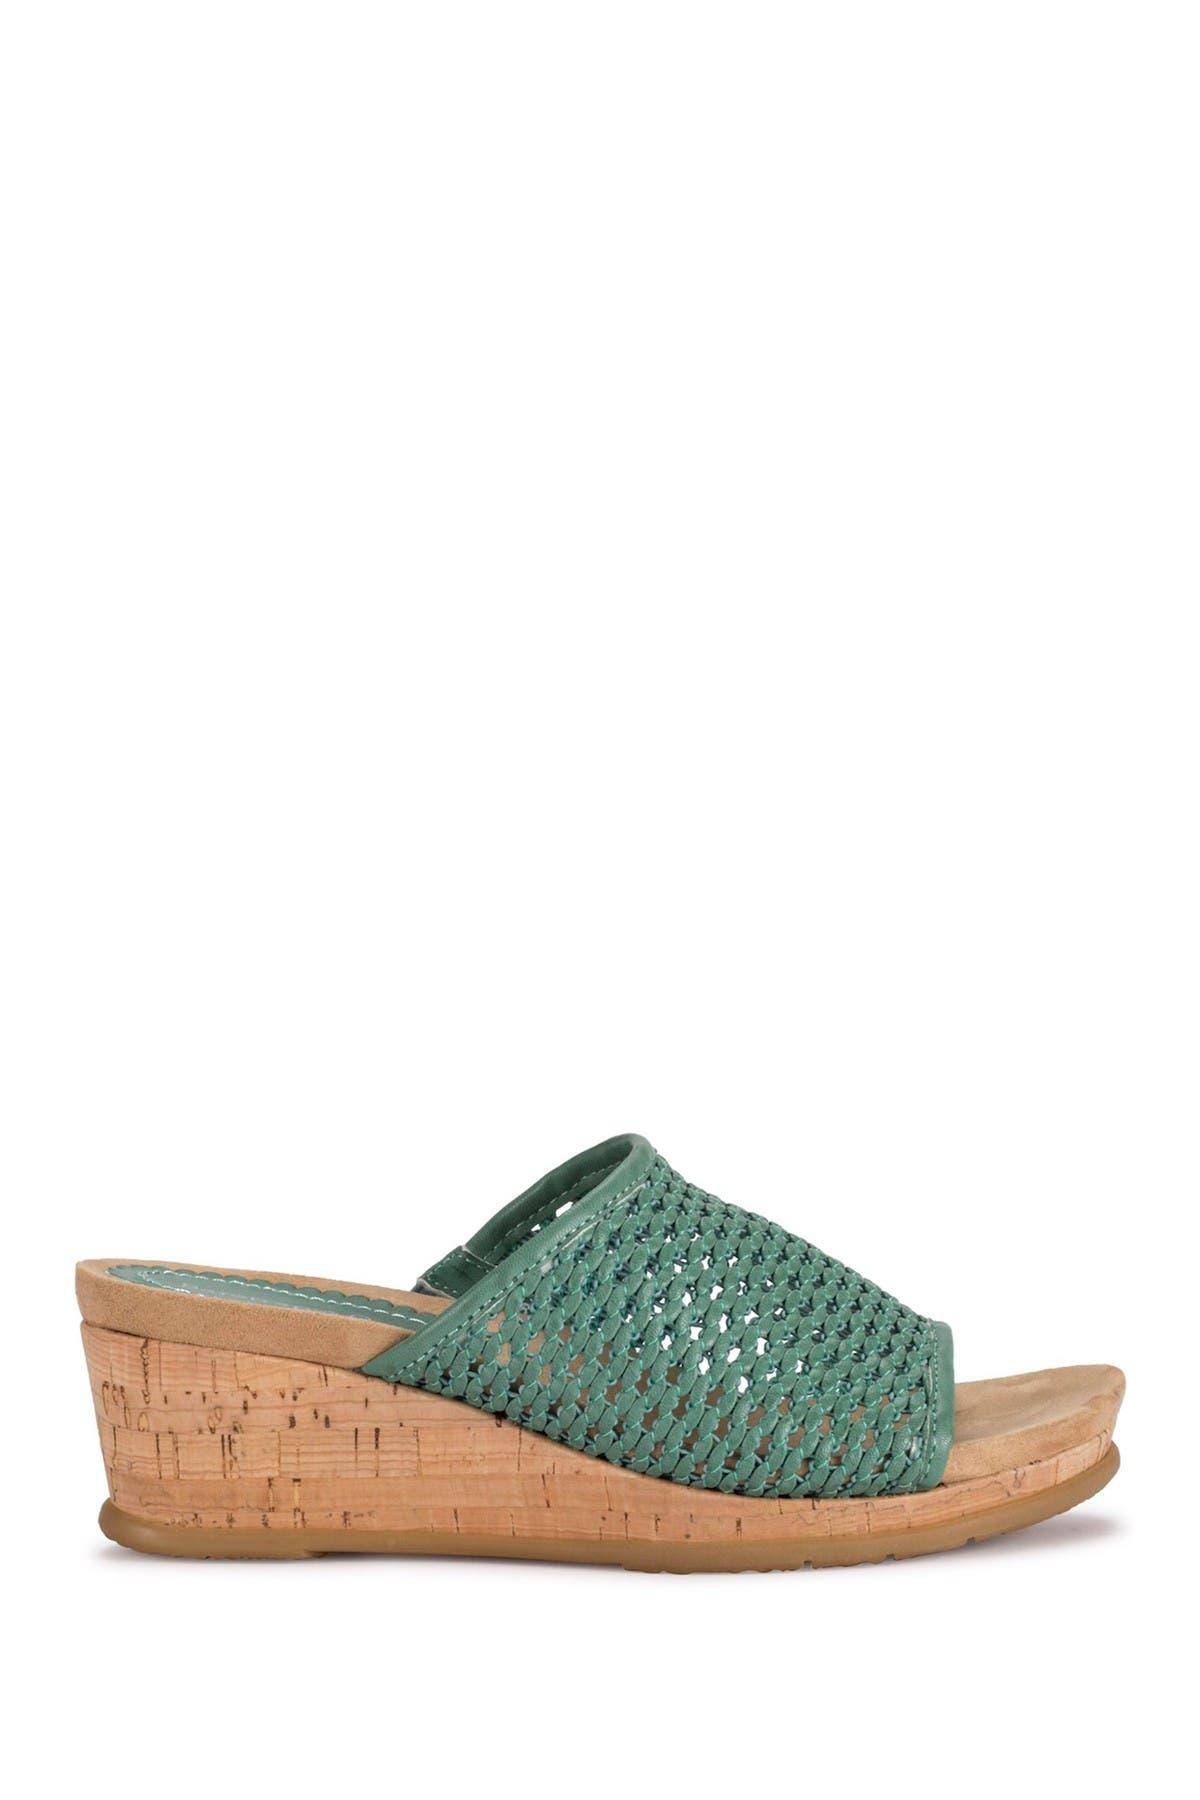 Baretraps Mid heels FLOSSY WOVEN WEDGE SANDAL